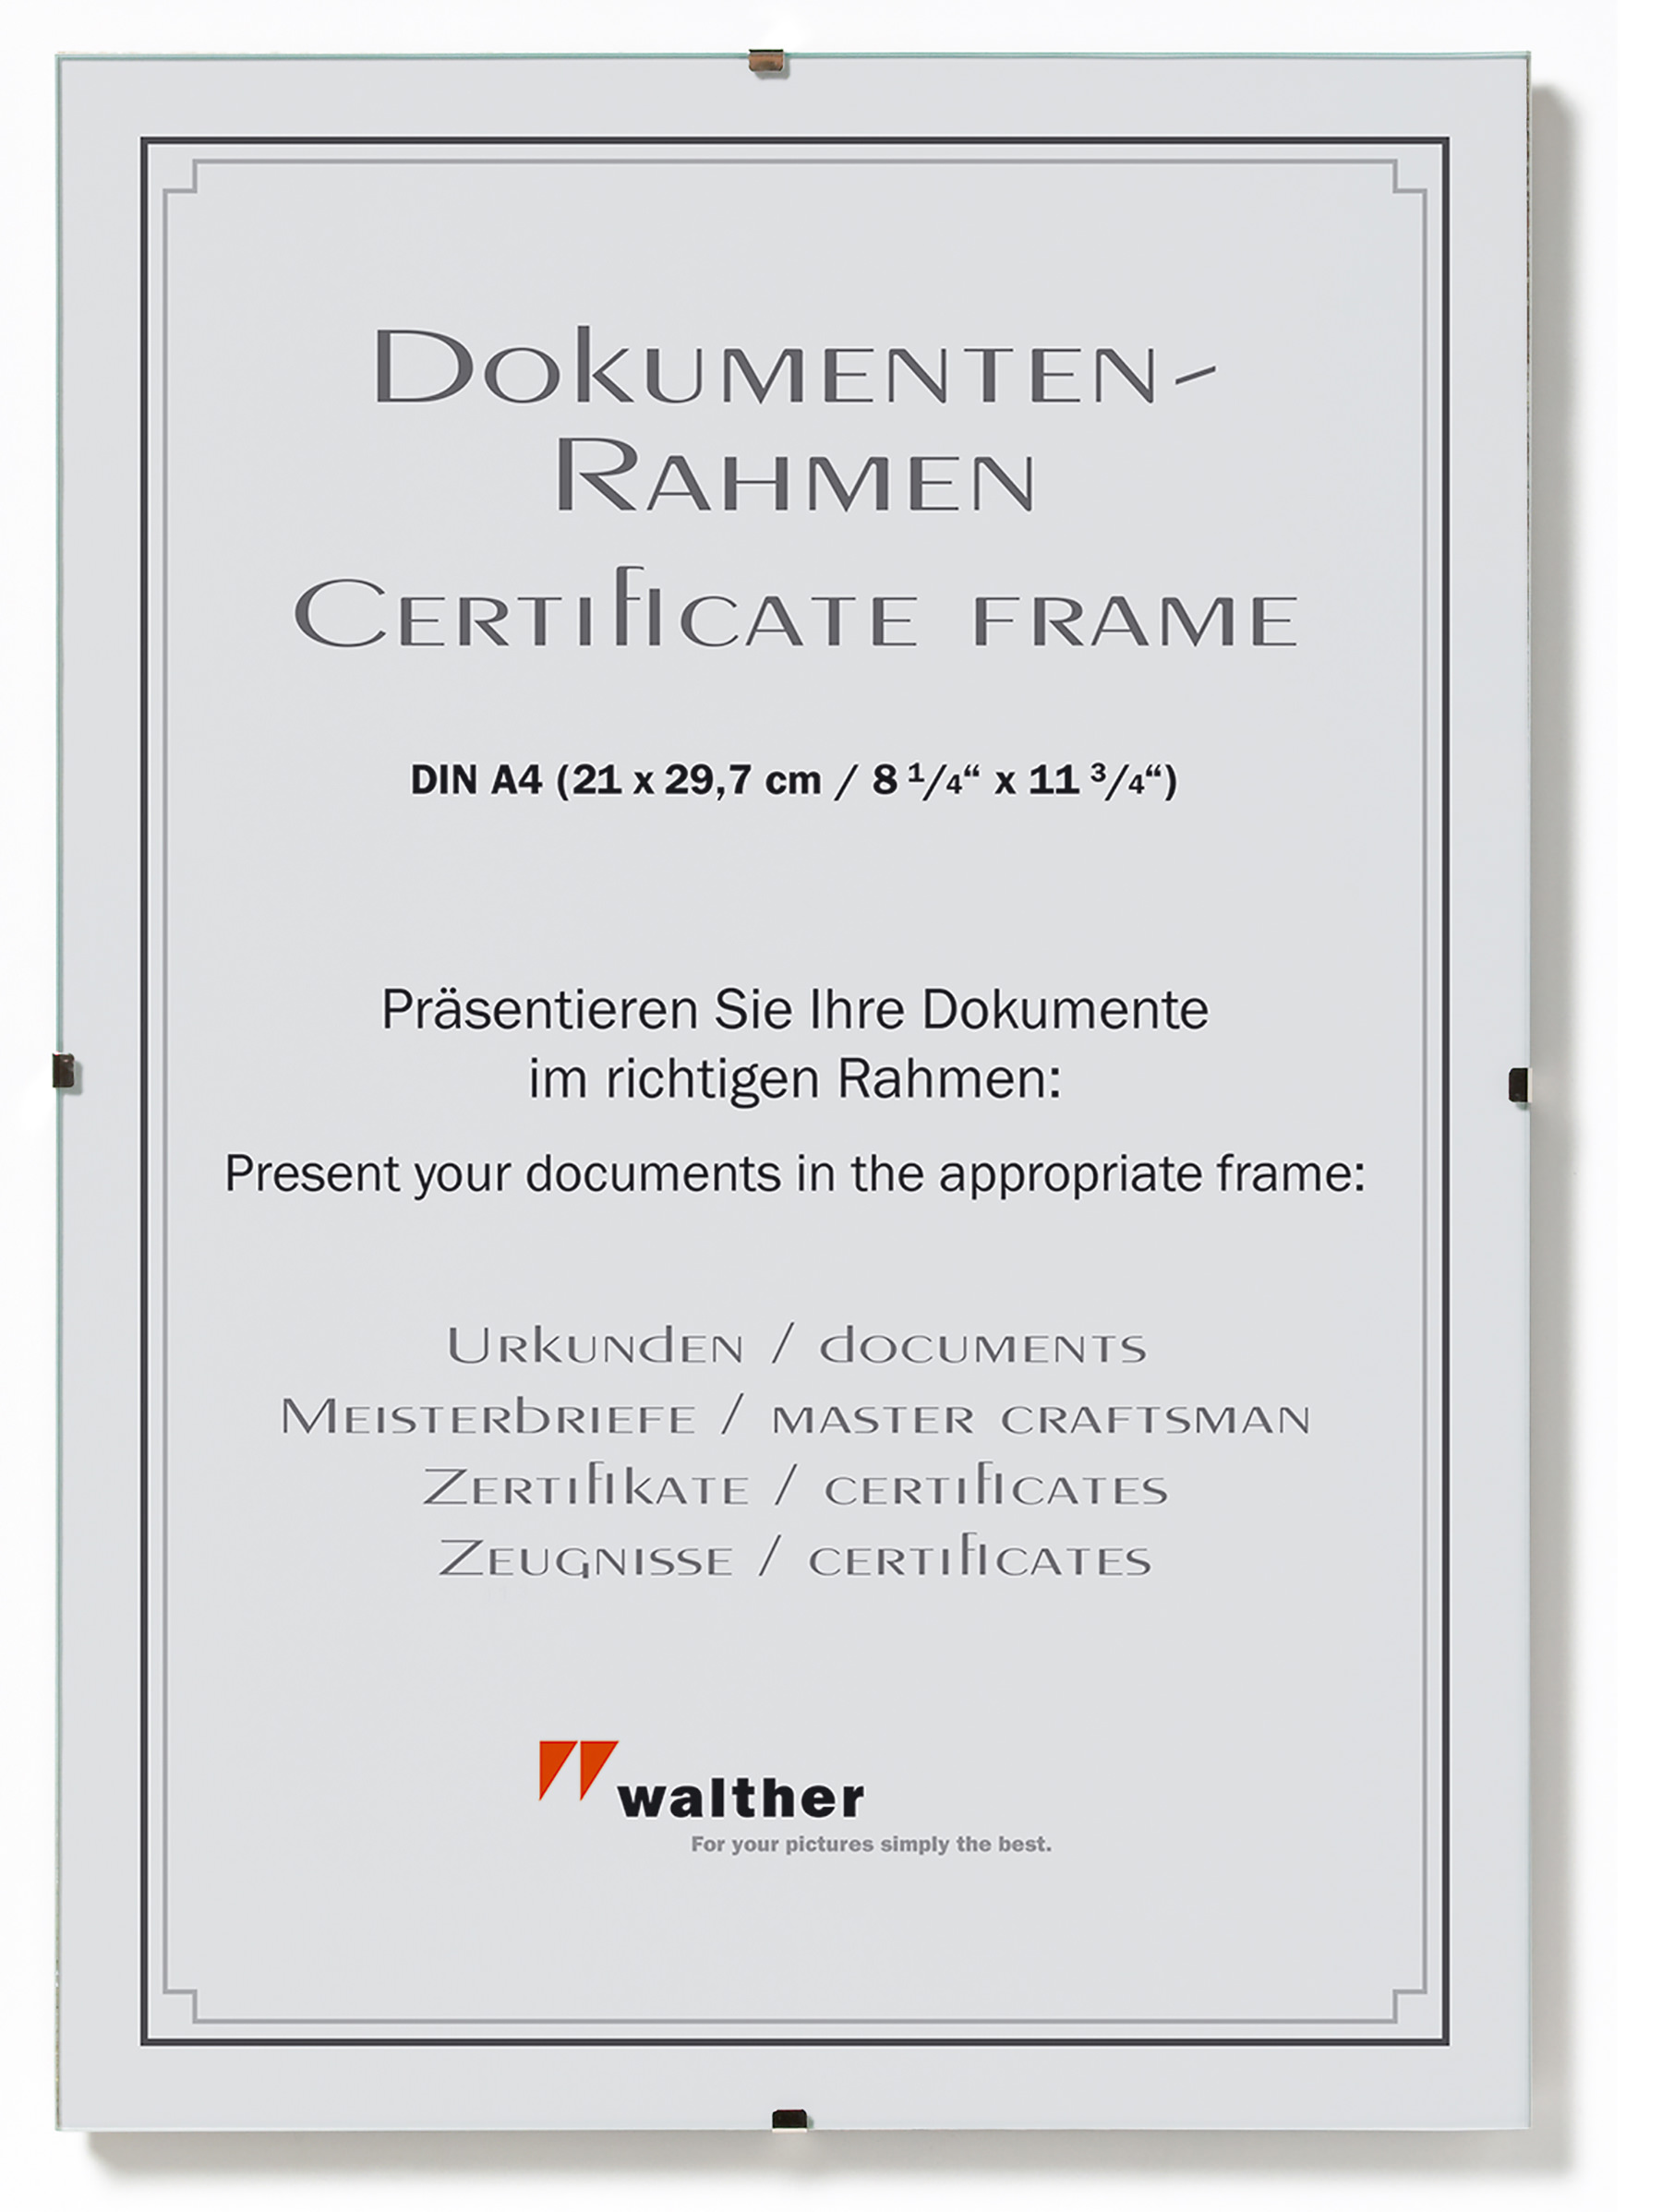 Charmant 8 5 X 5 5 Zertifikat Rahmen Galerie - Benutzerdefinierte ...